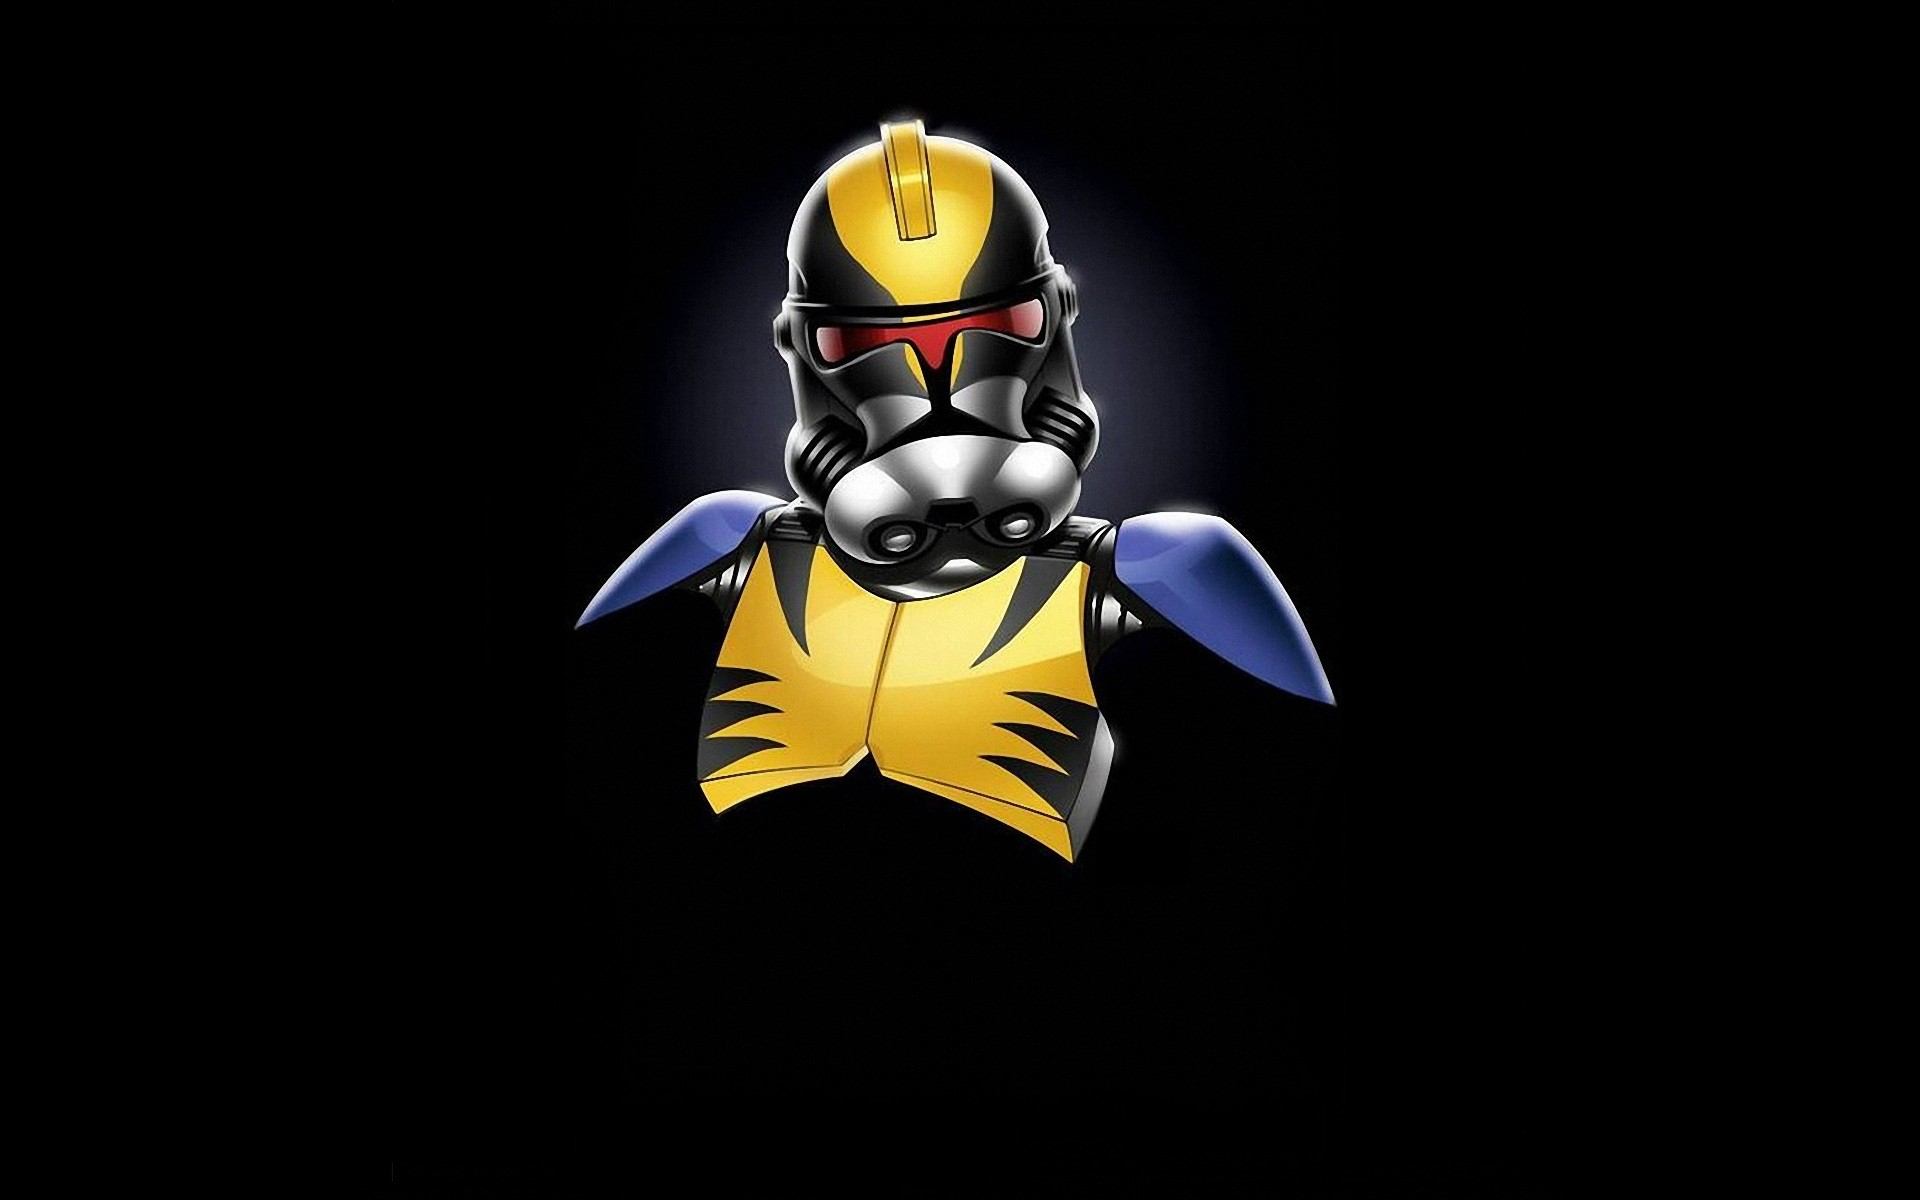 3d Wallpaper Star Wars Star Wars Minimalistic Stormtroopers Wolverine Marvel